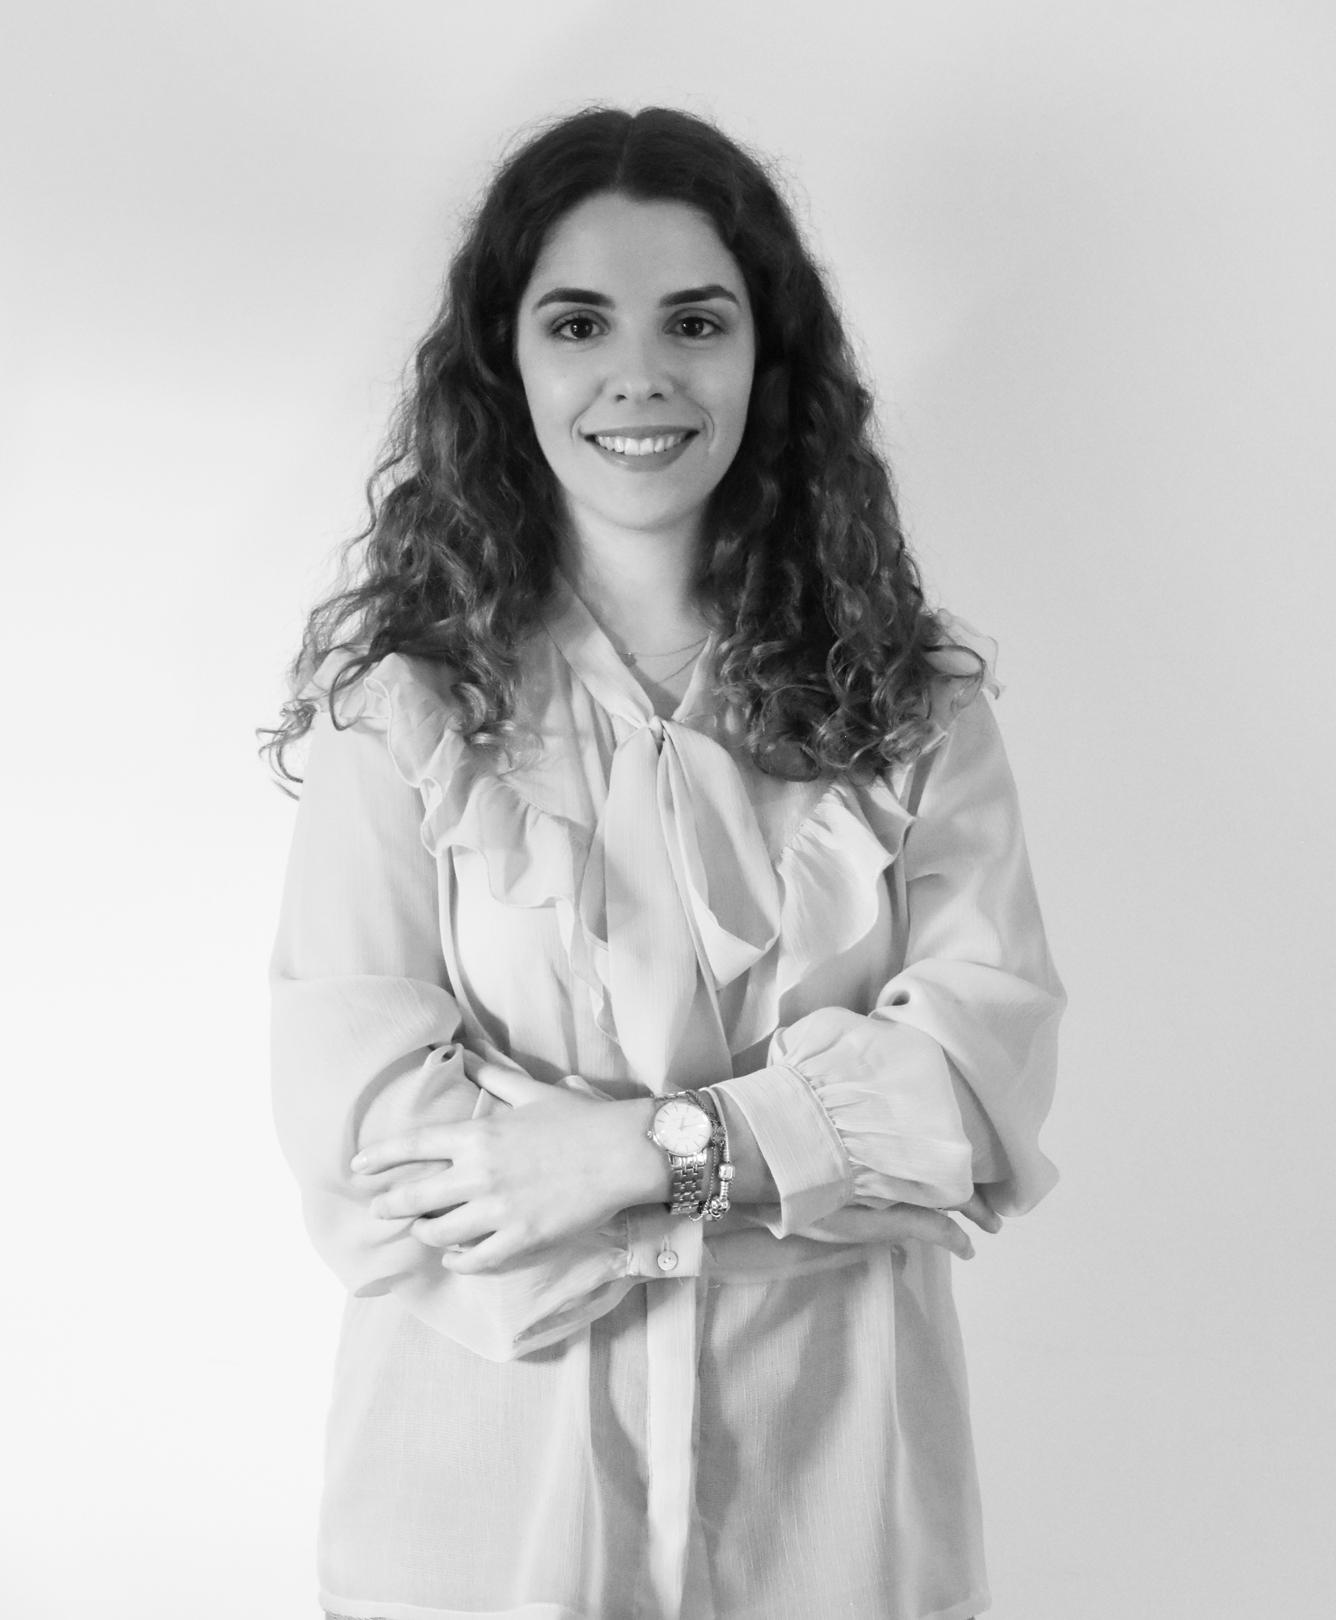 Beatriz Couto foto.